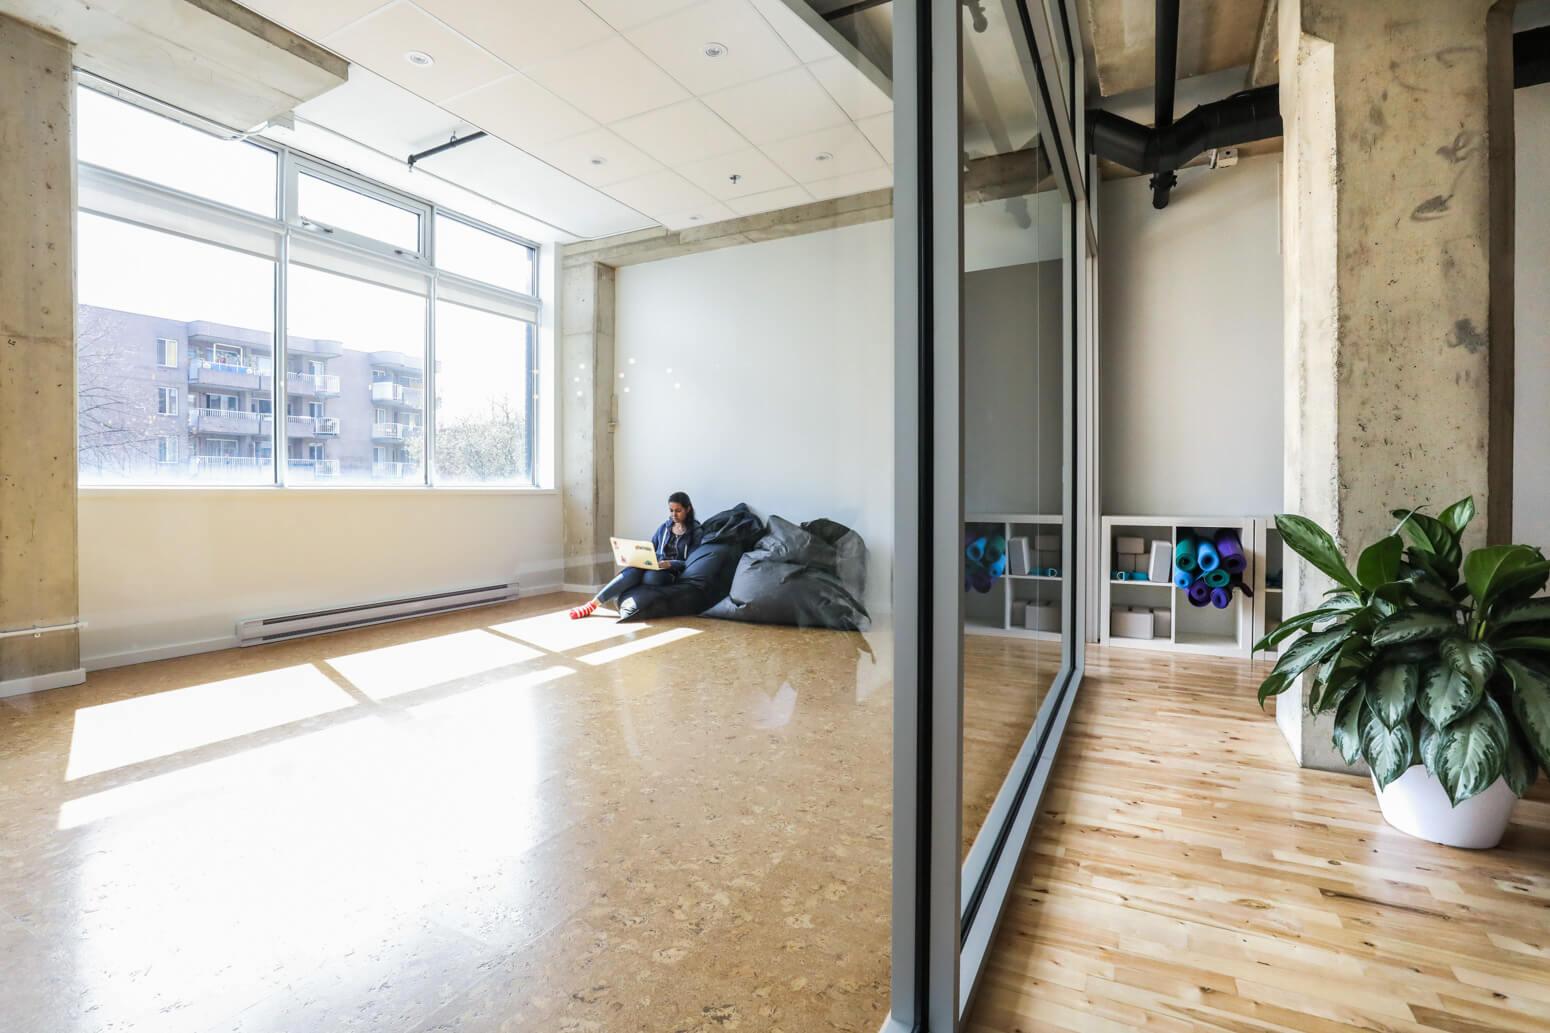 Shutterstock Montreal Office Killer Spaces-1